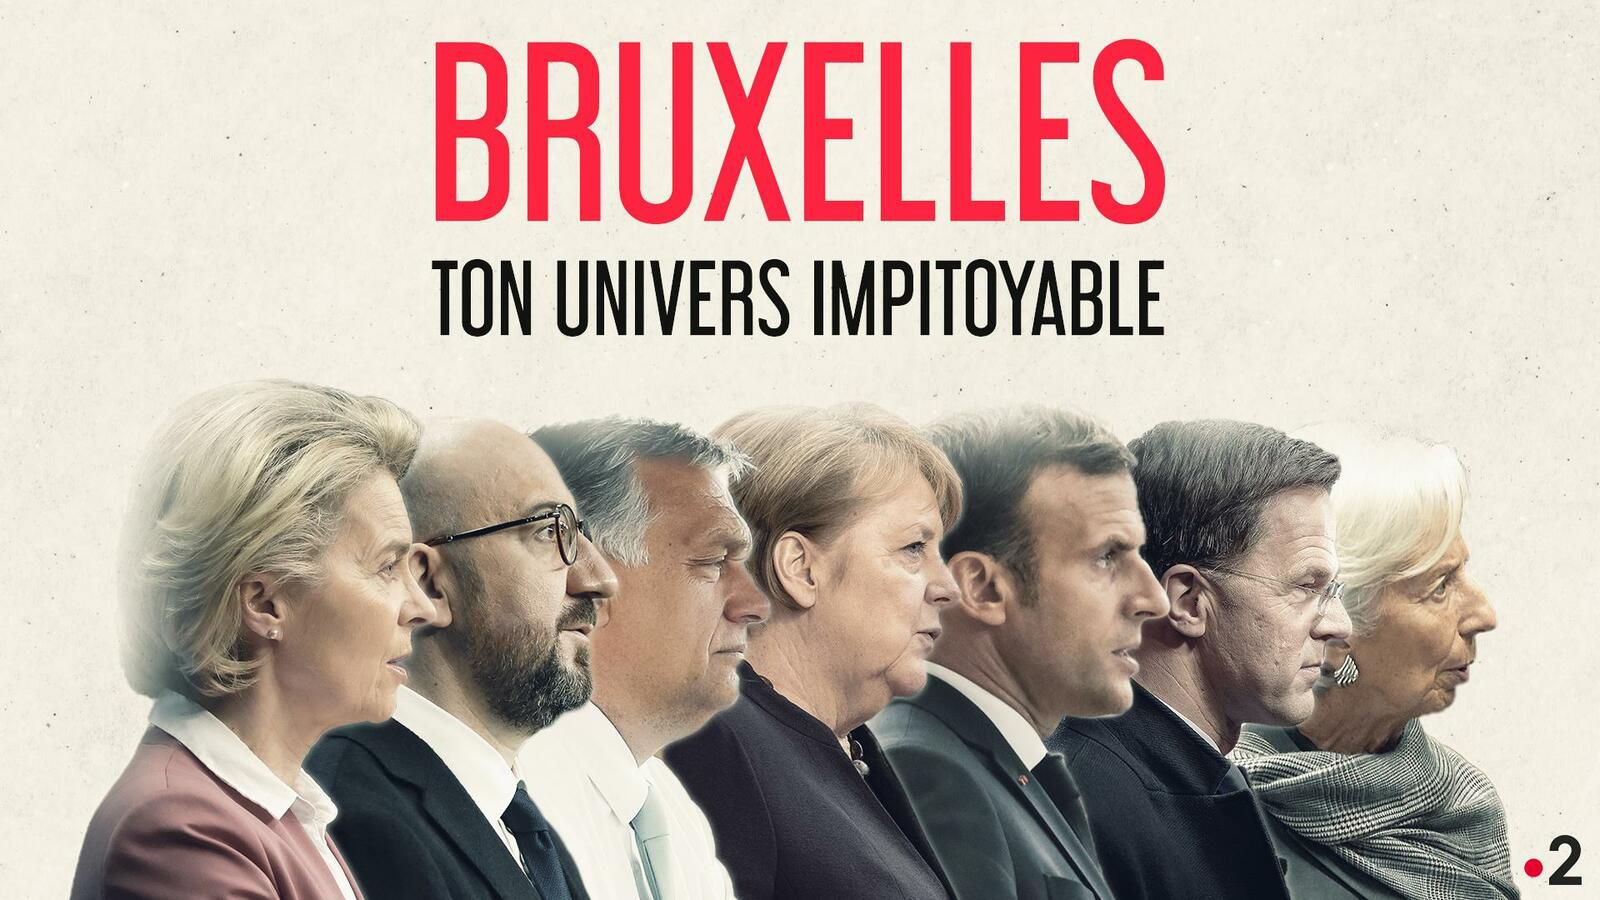 Bruxelles ton univers impitoyable - France 2 -